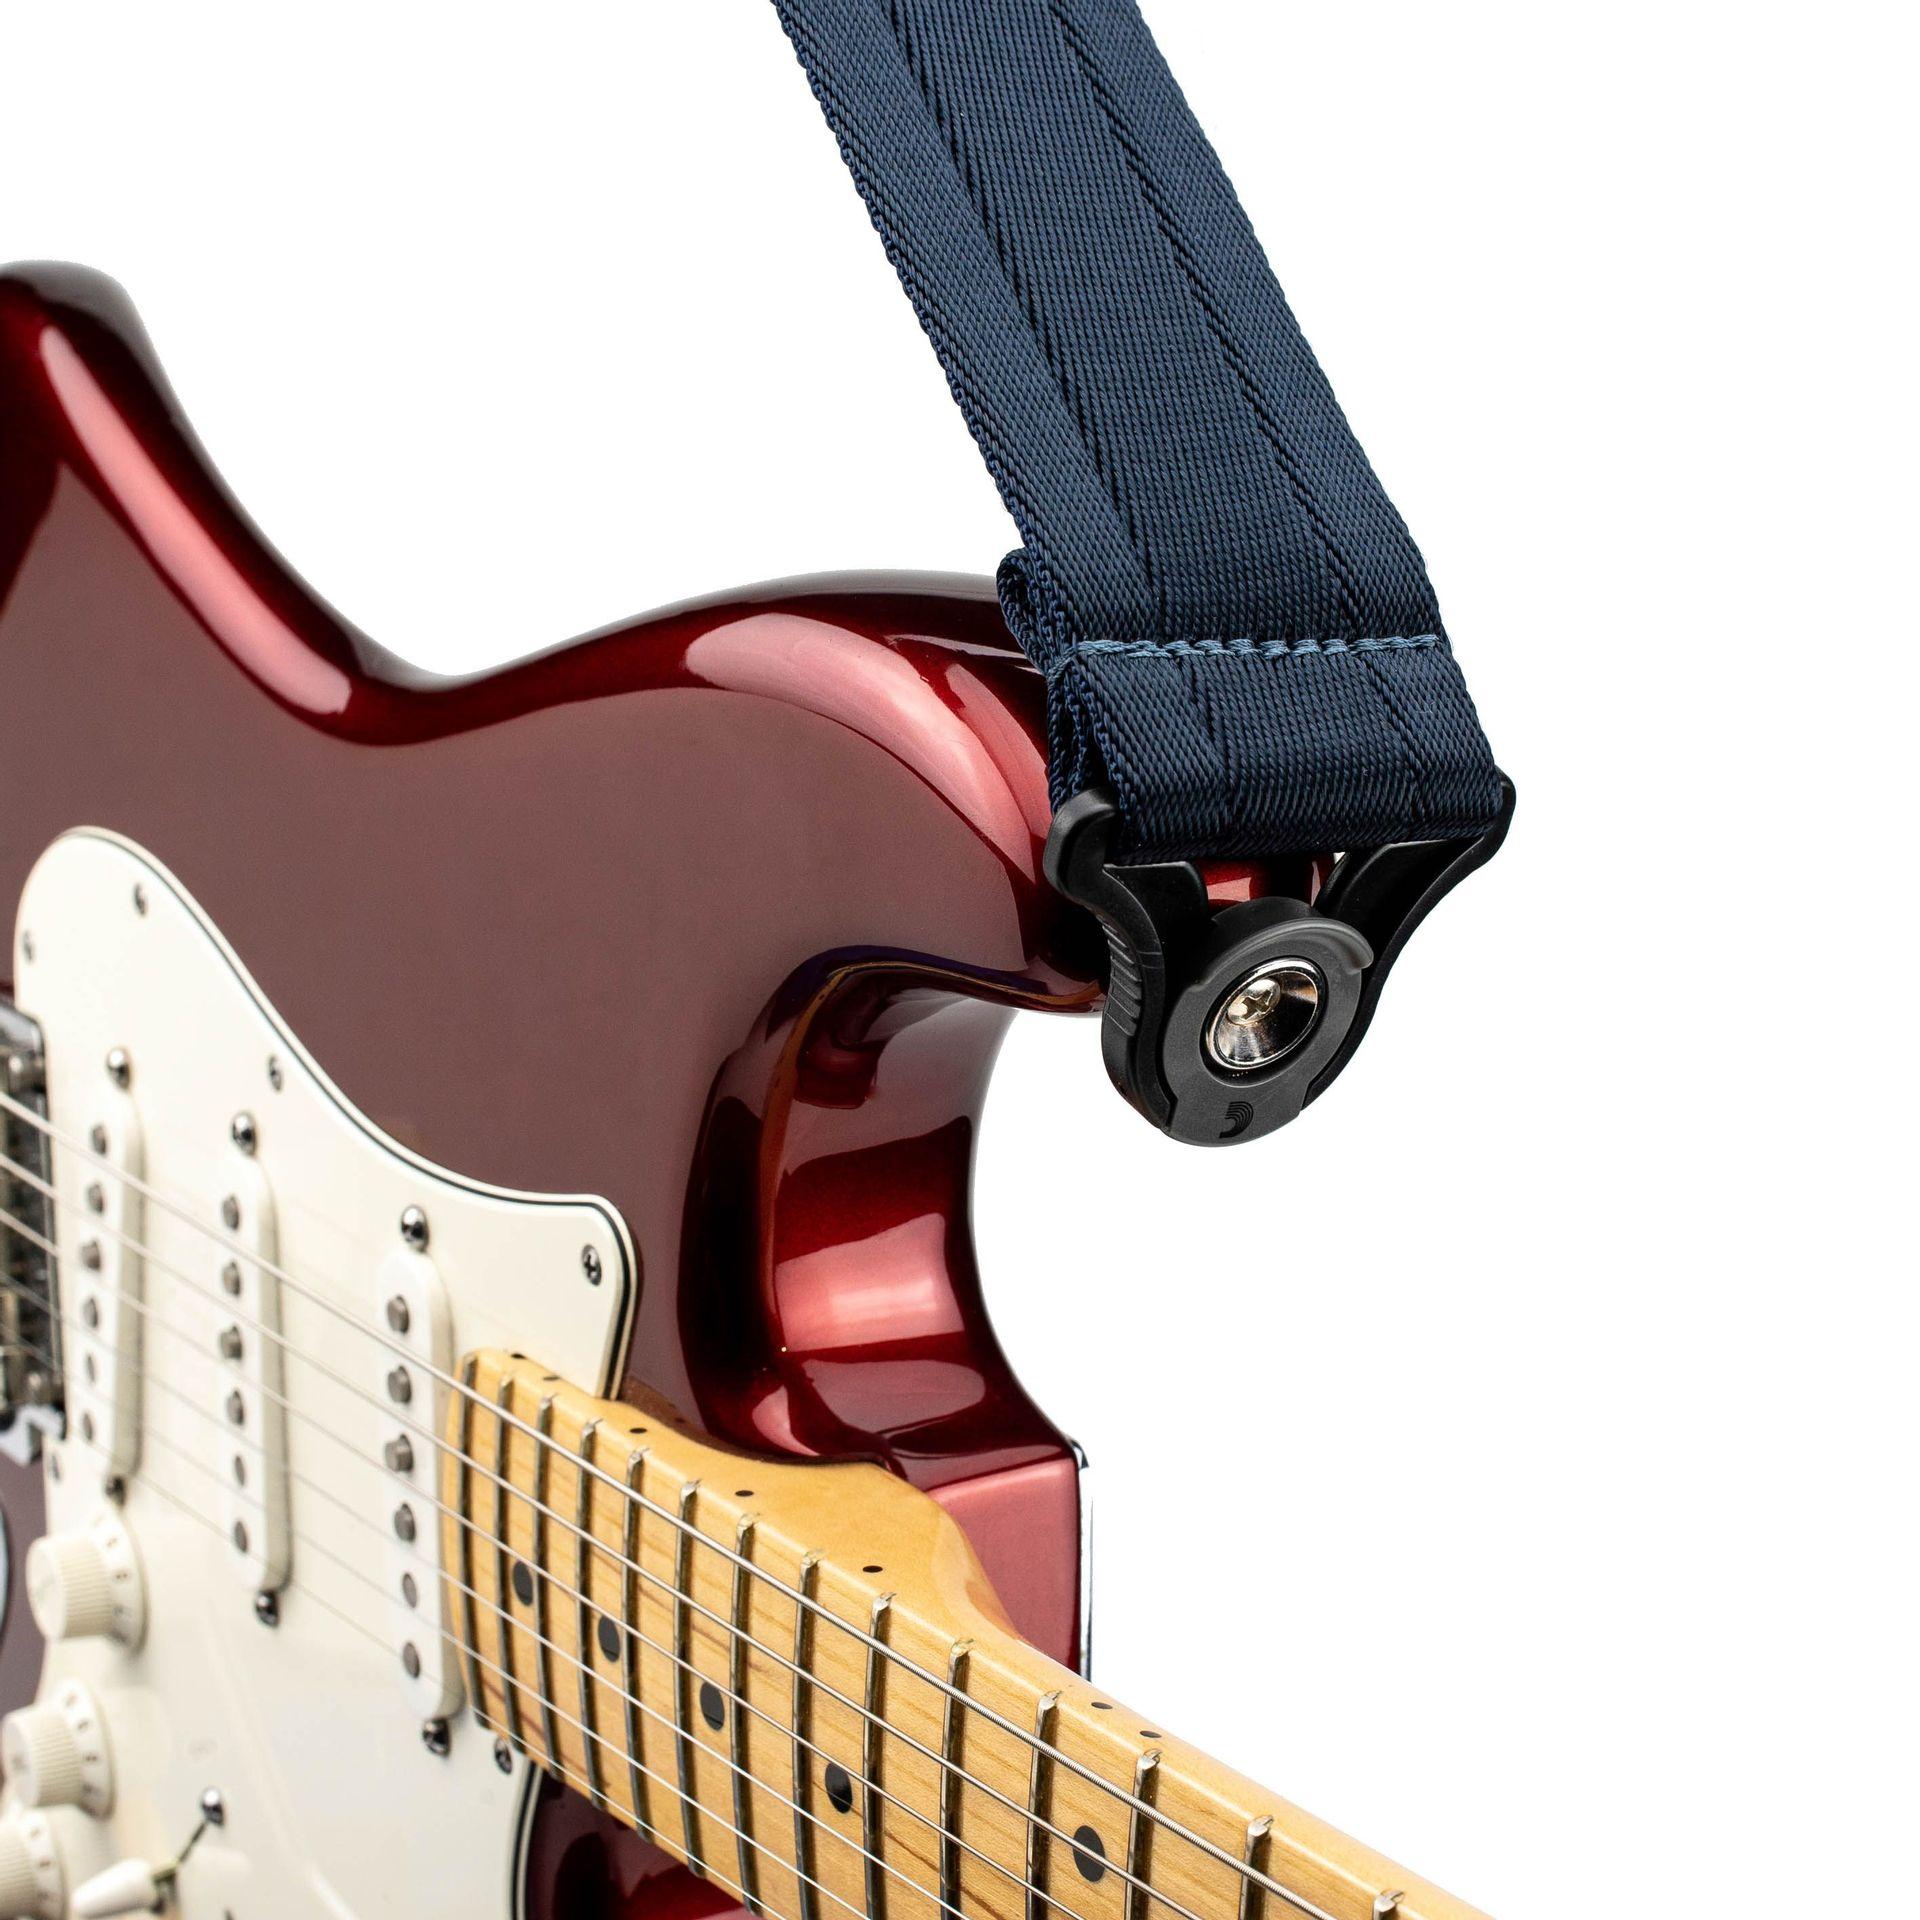 D'Addario Auto Lock Guitar Strap Midnight 50BAL10